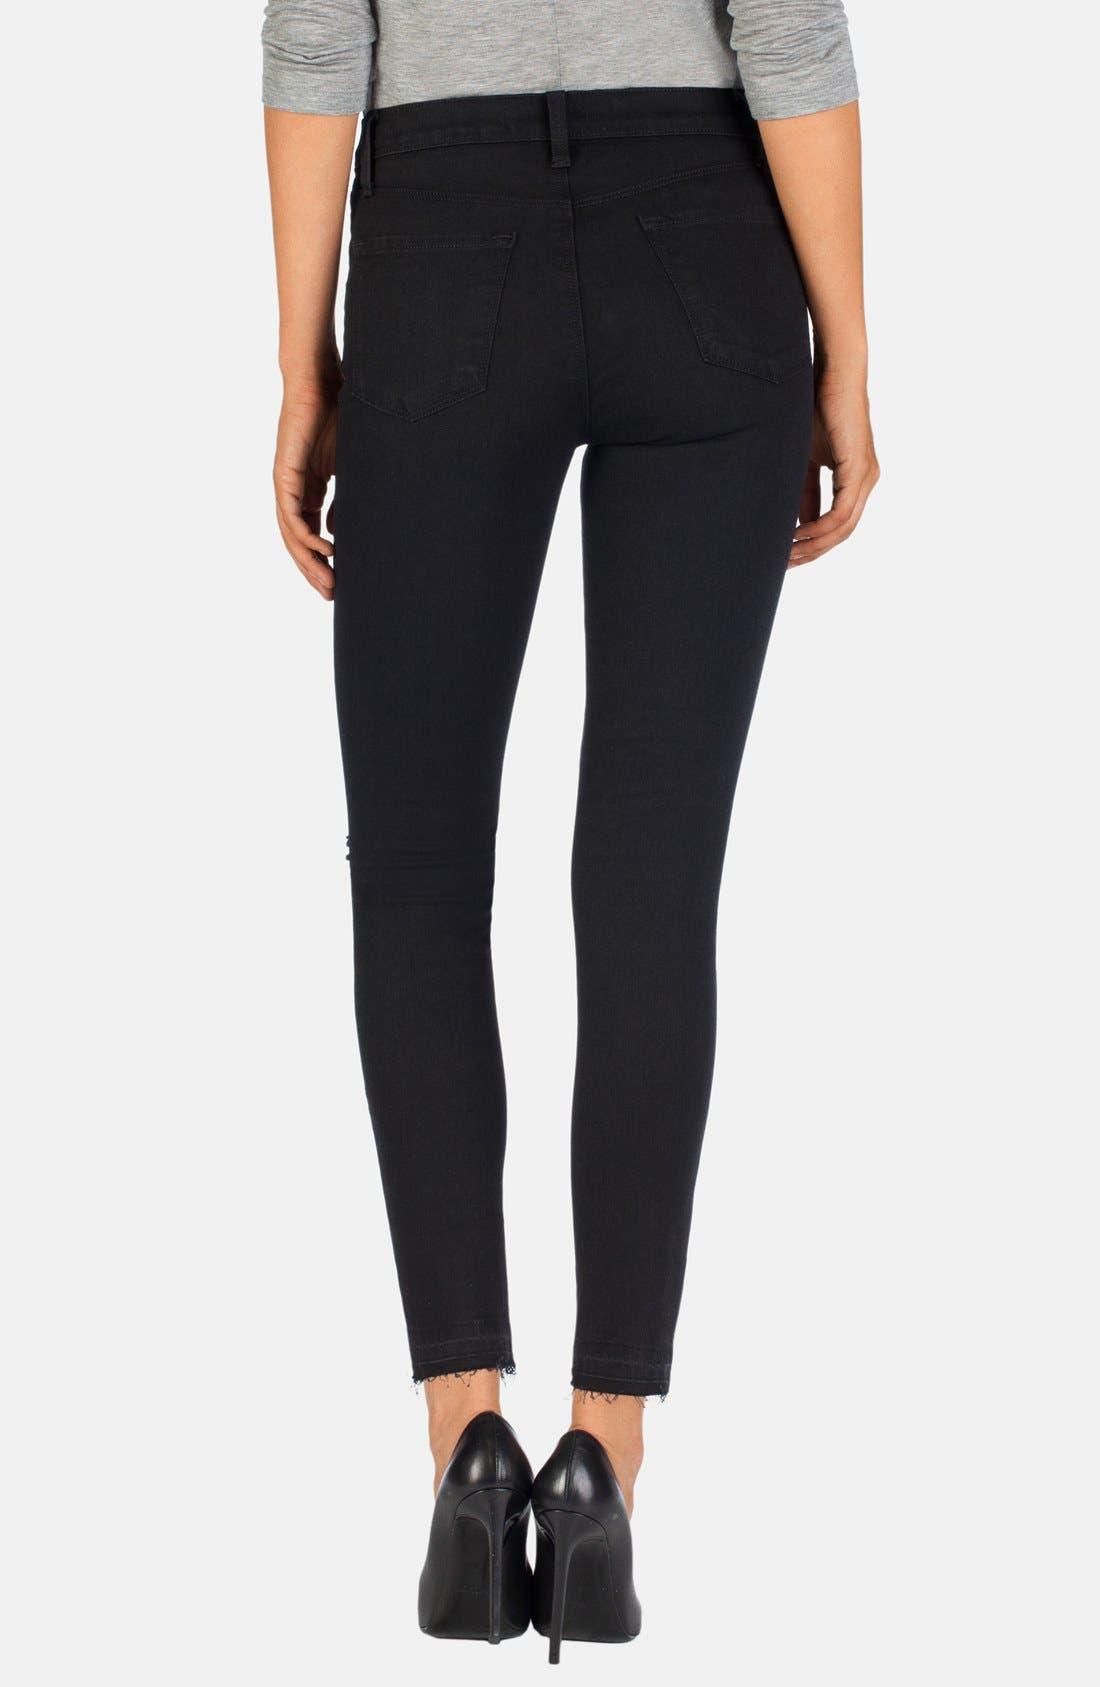 Alternate Image 2  - J Brand 'Alana' High Rise Crop Jeans (Offbeat)